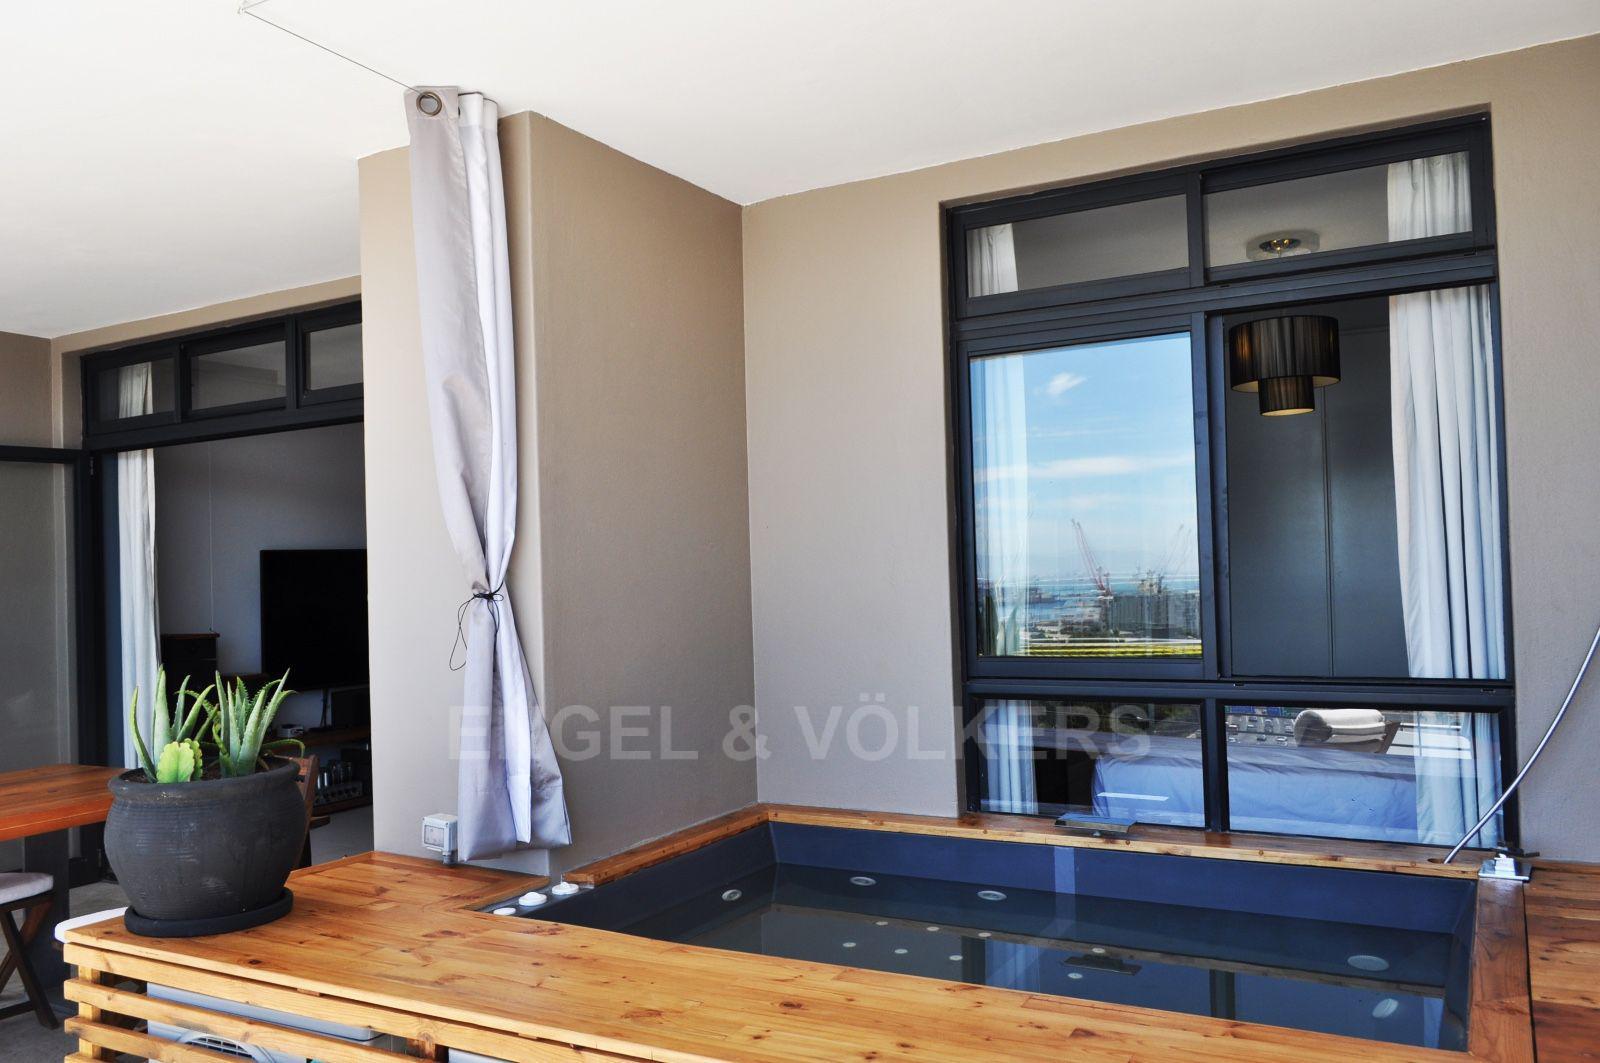 De Waterkant property for sale. Ref No: 13450081. Picture no 3